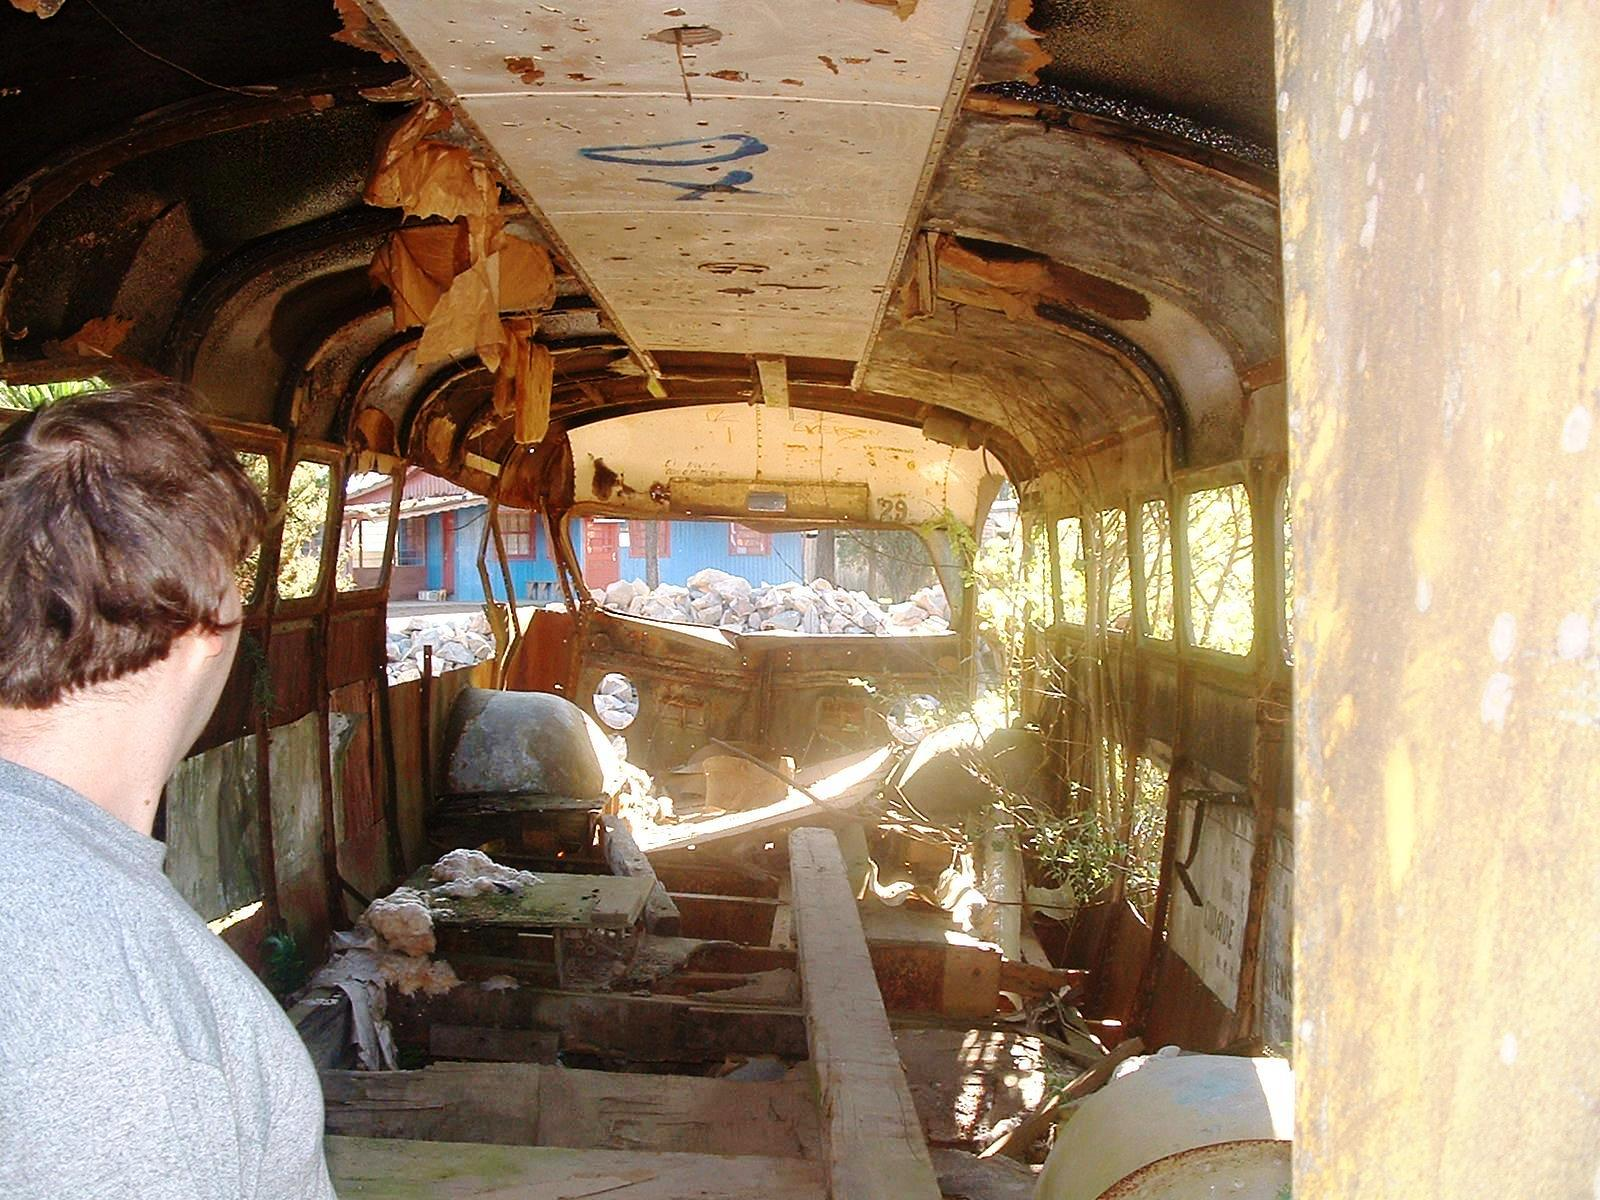 genaro_onibus_canela-rs-1 Ônibus (?!) em Canela-RS